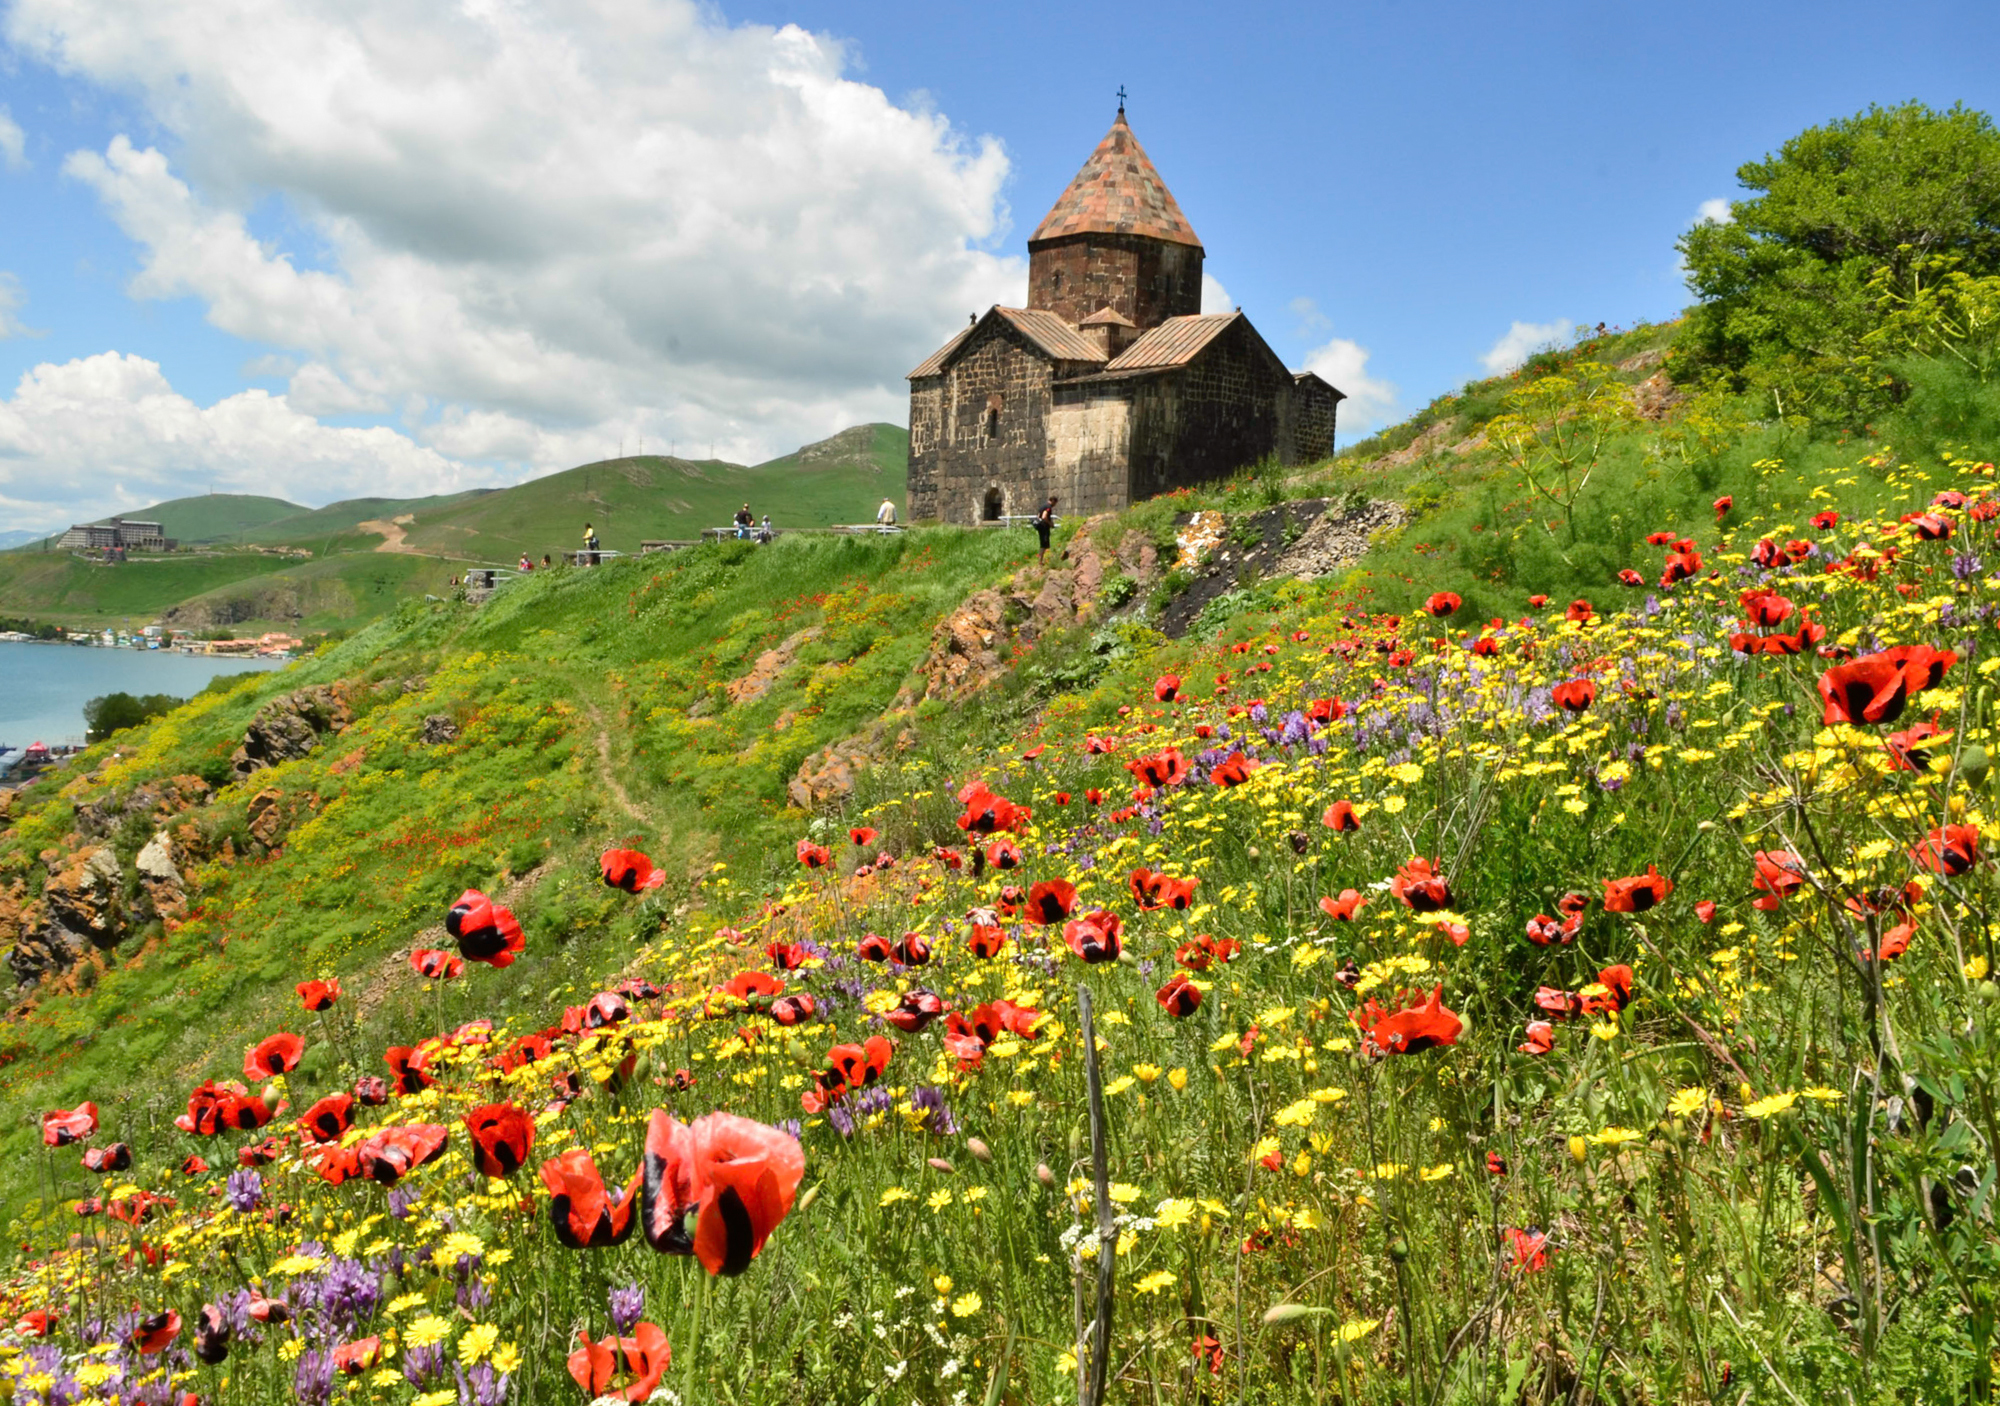 The Sevan Monestary, overlooking the Lake Sevan in central Armenia.